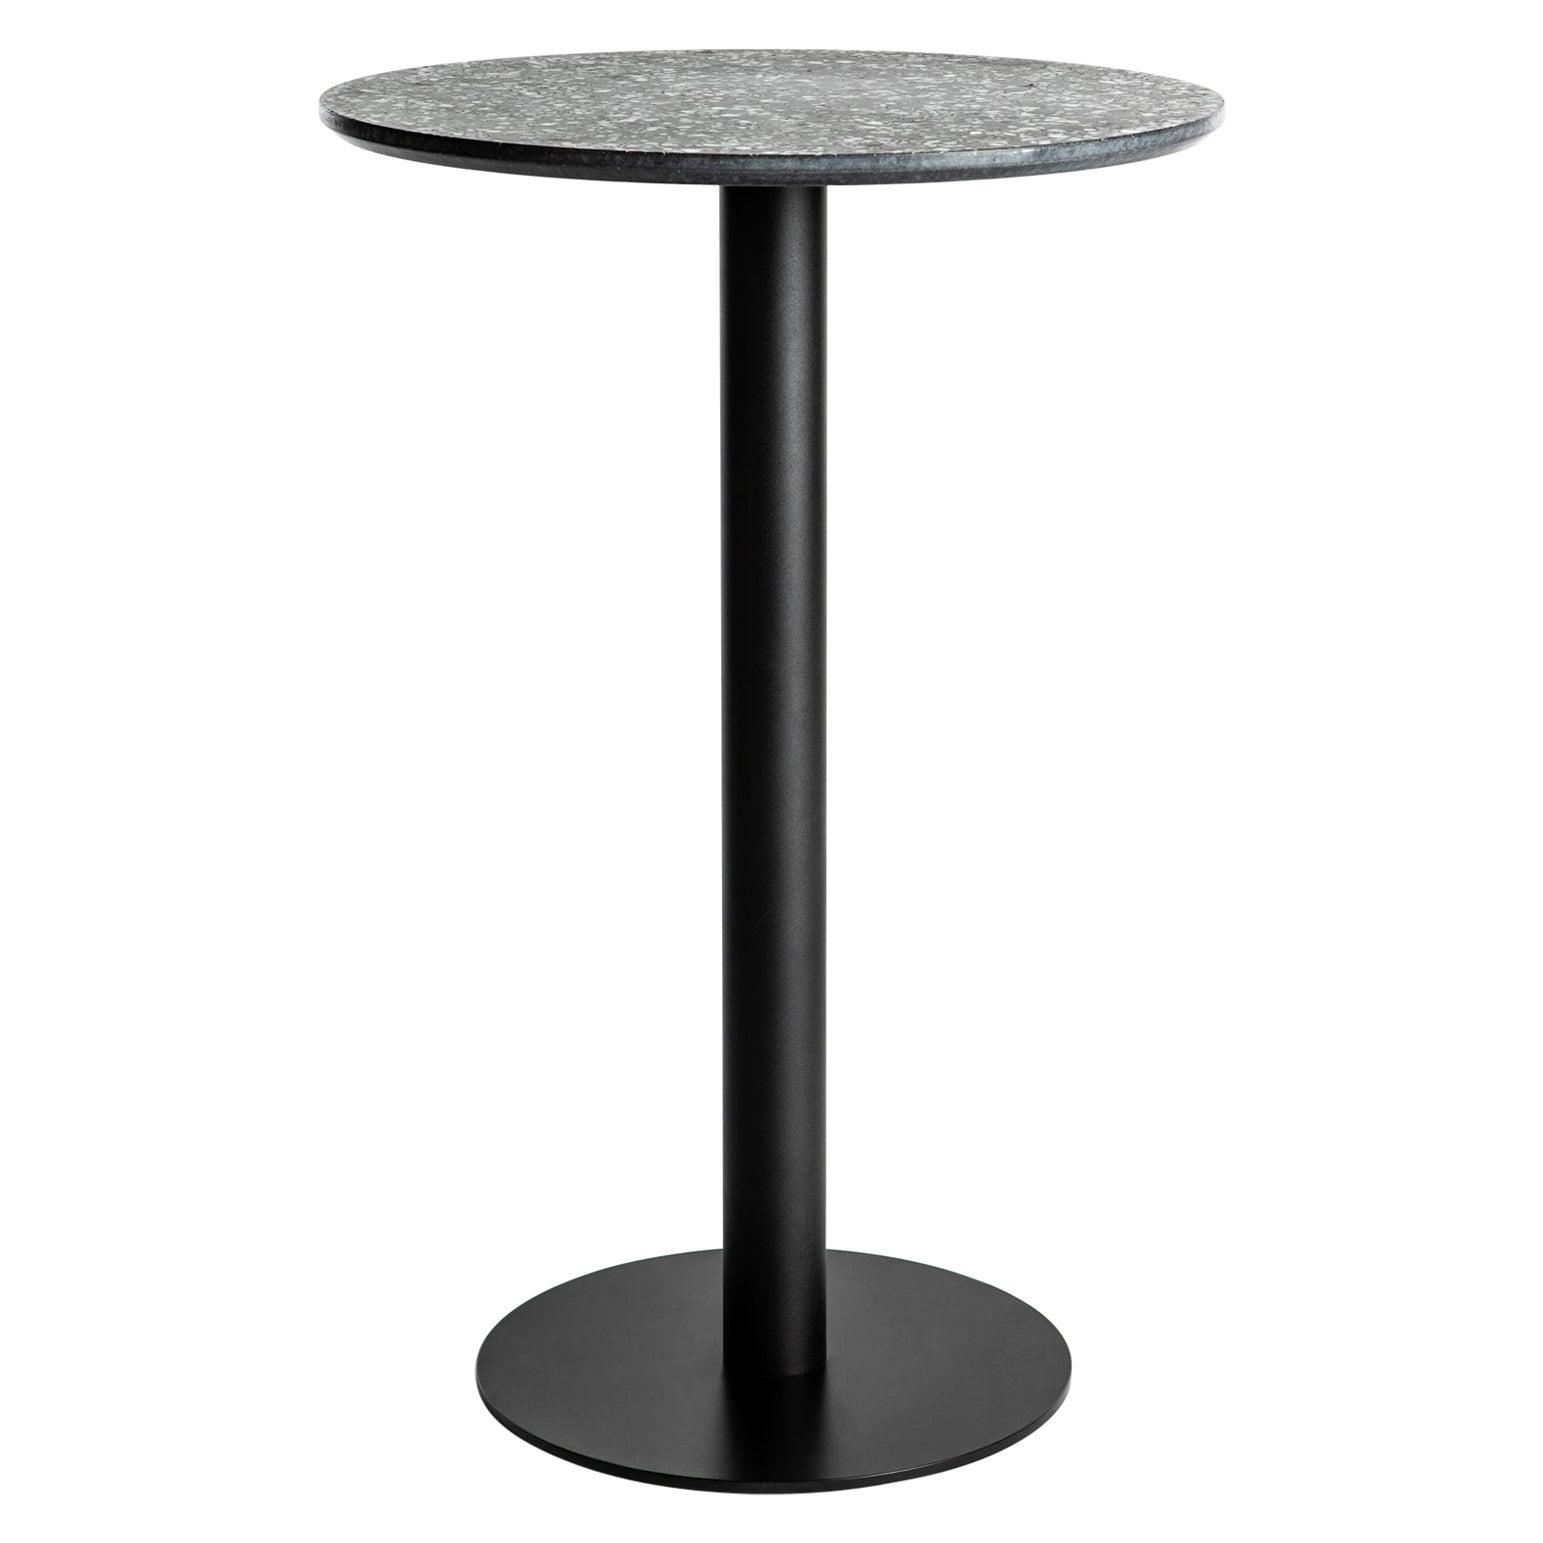 Guéridon / Bistro Table 'I' in Black Terrazzo